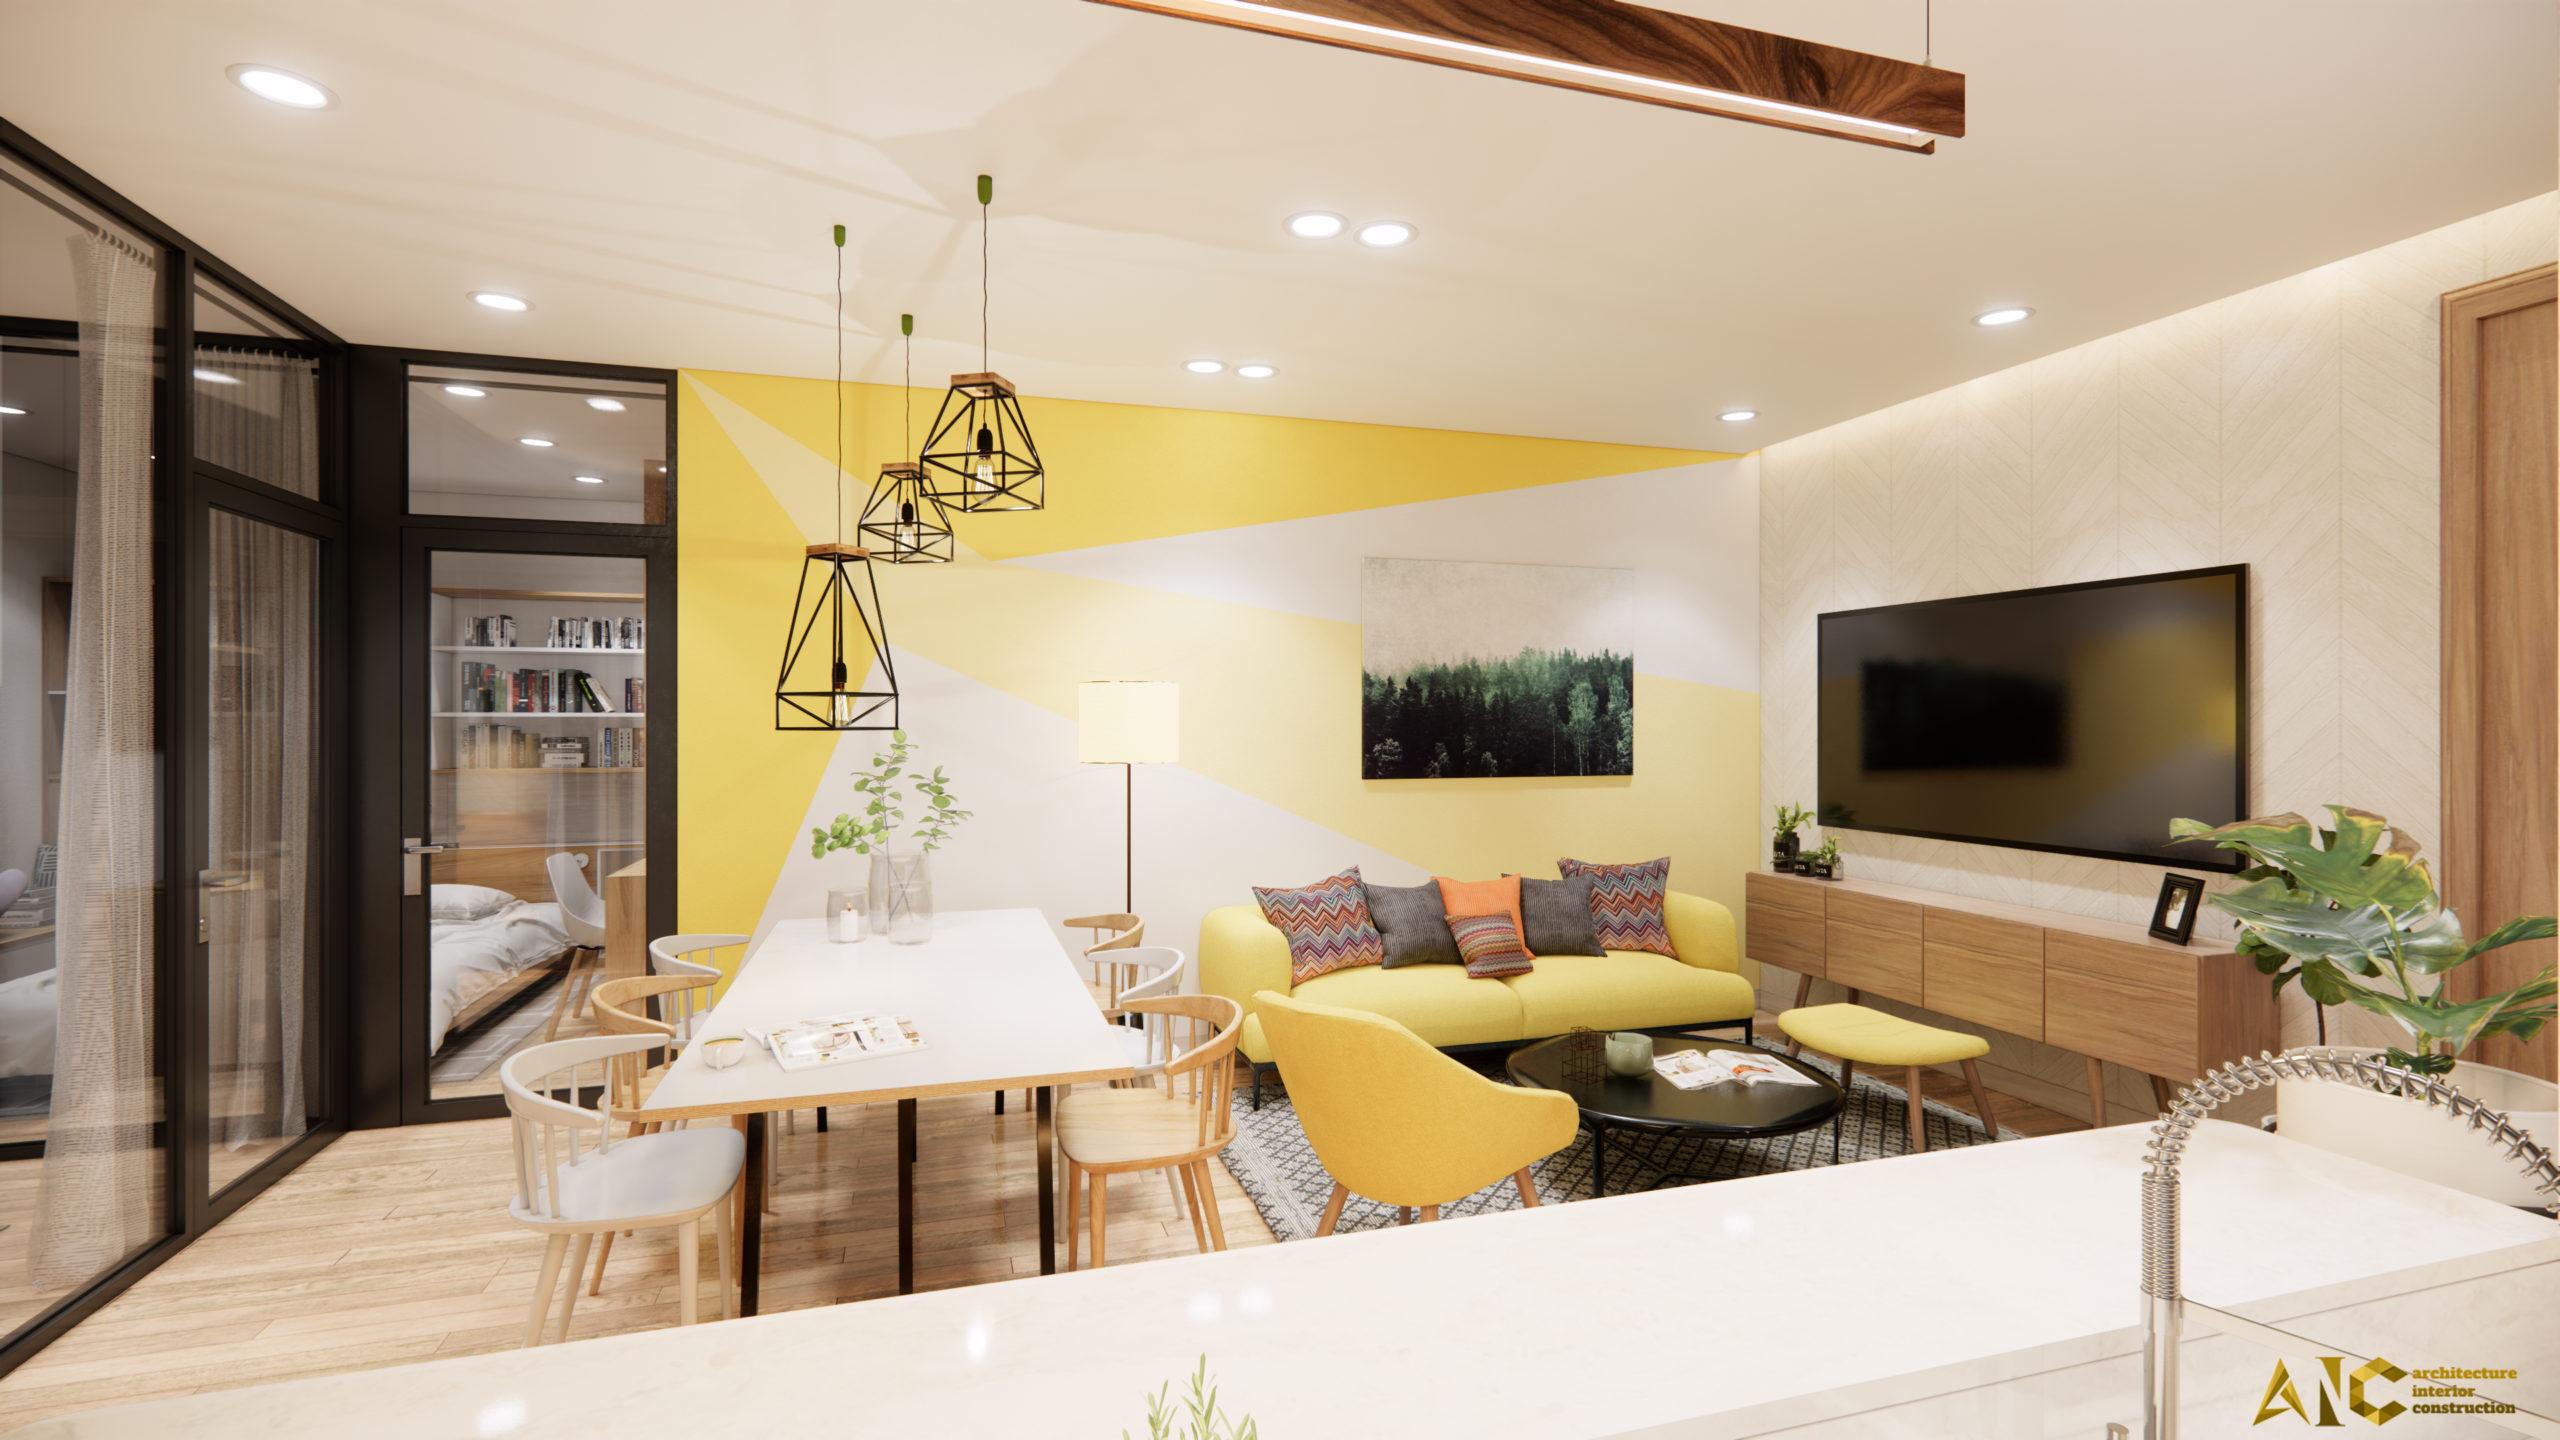 thiết kế căn hộ him lam (23)